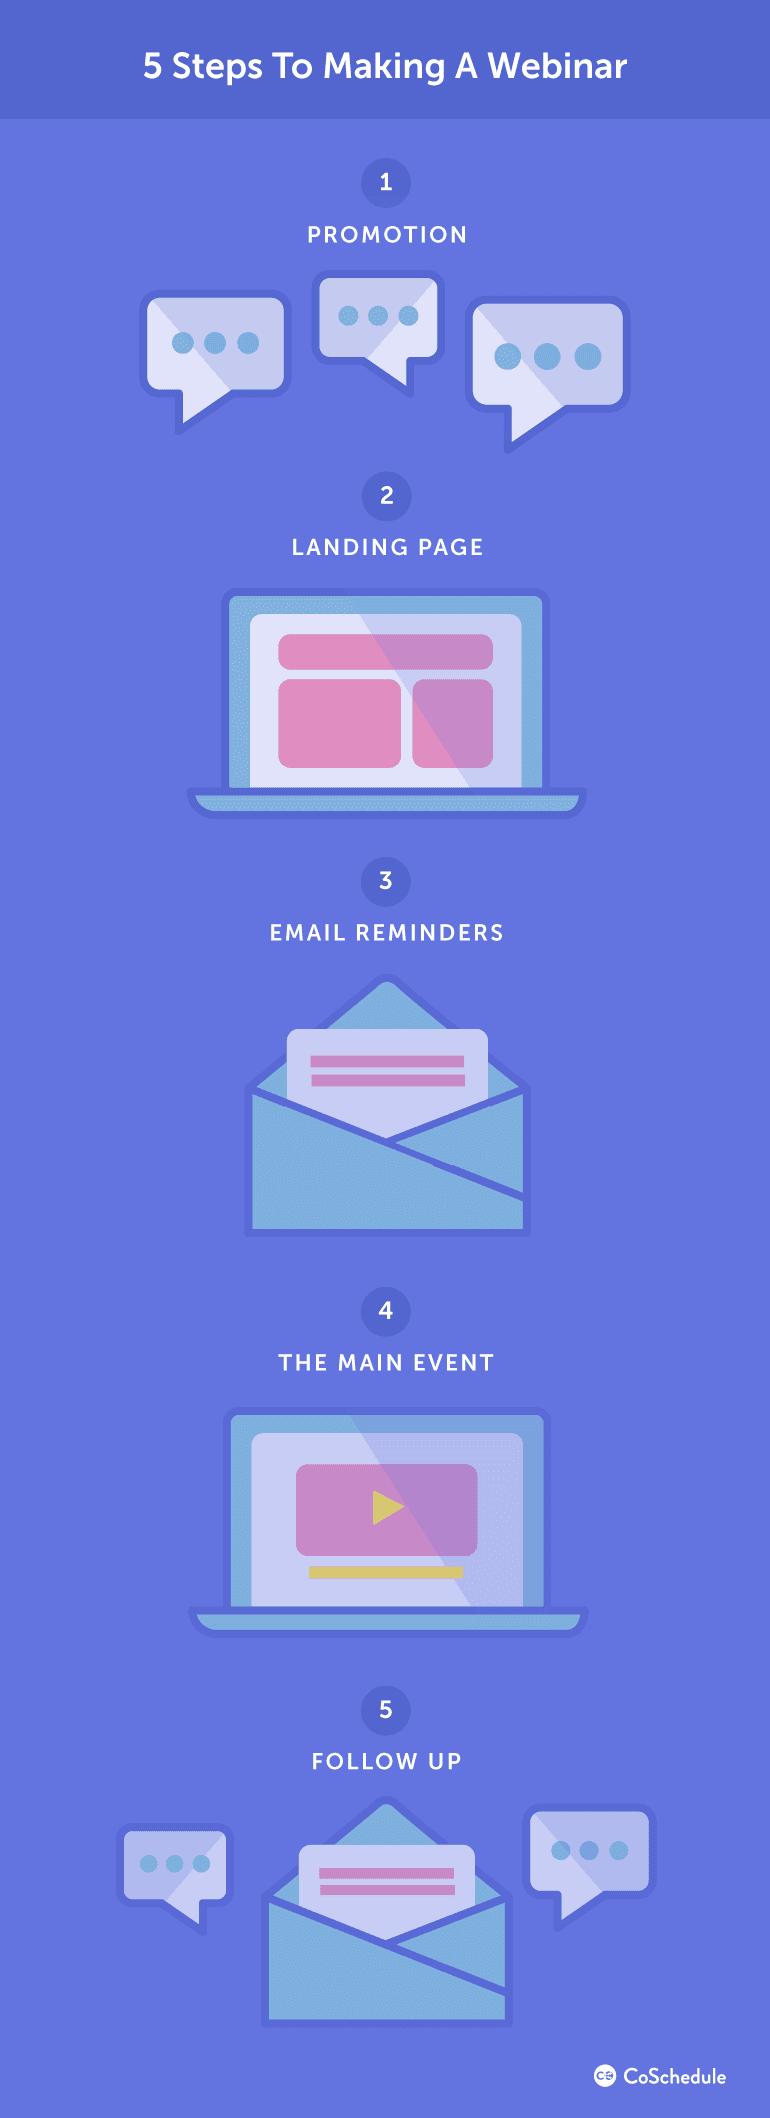 Five Steps to Making a Webinar